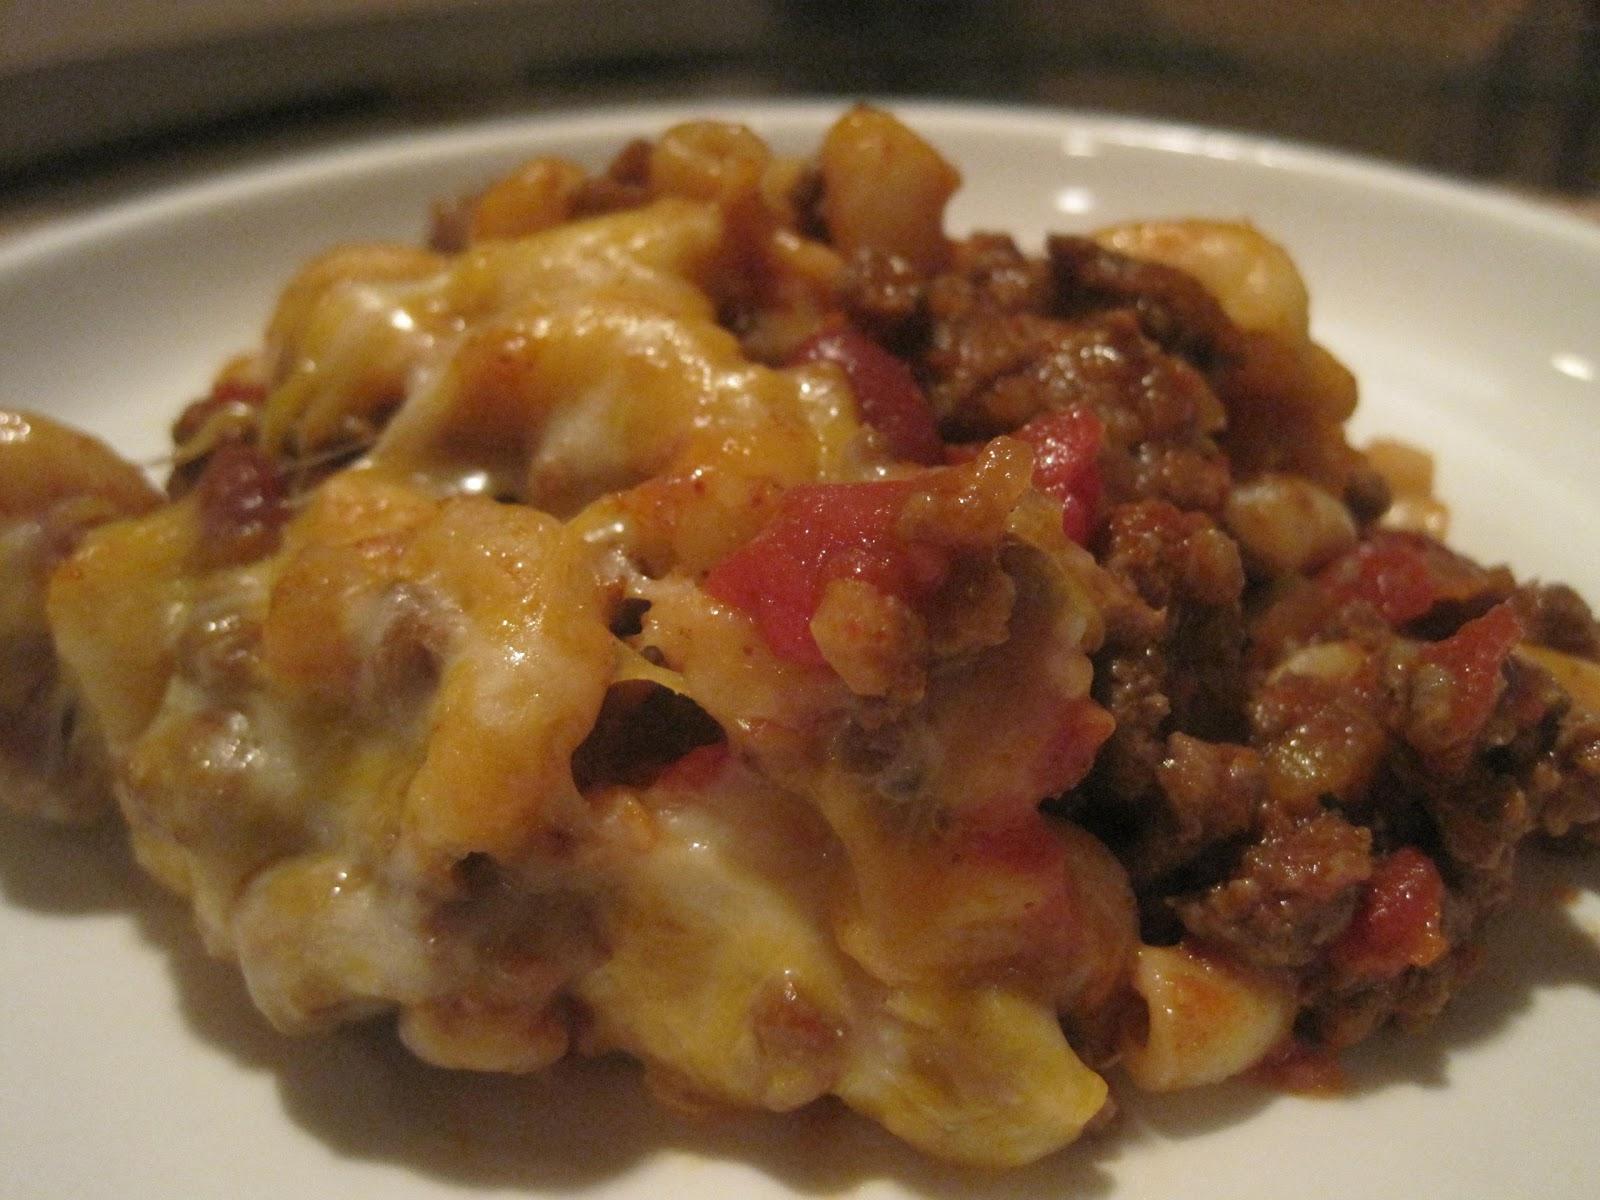 Recipes Re-Mixed: Chili Mac